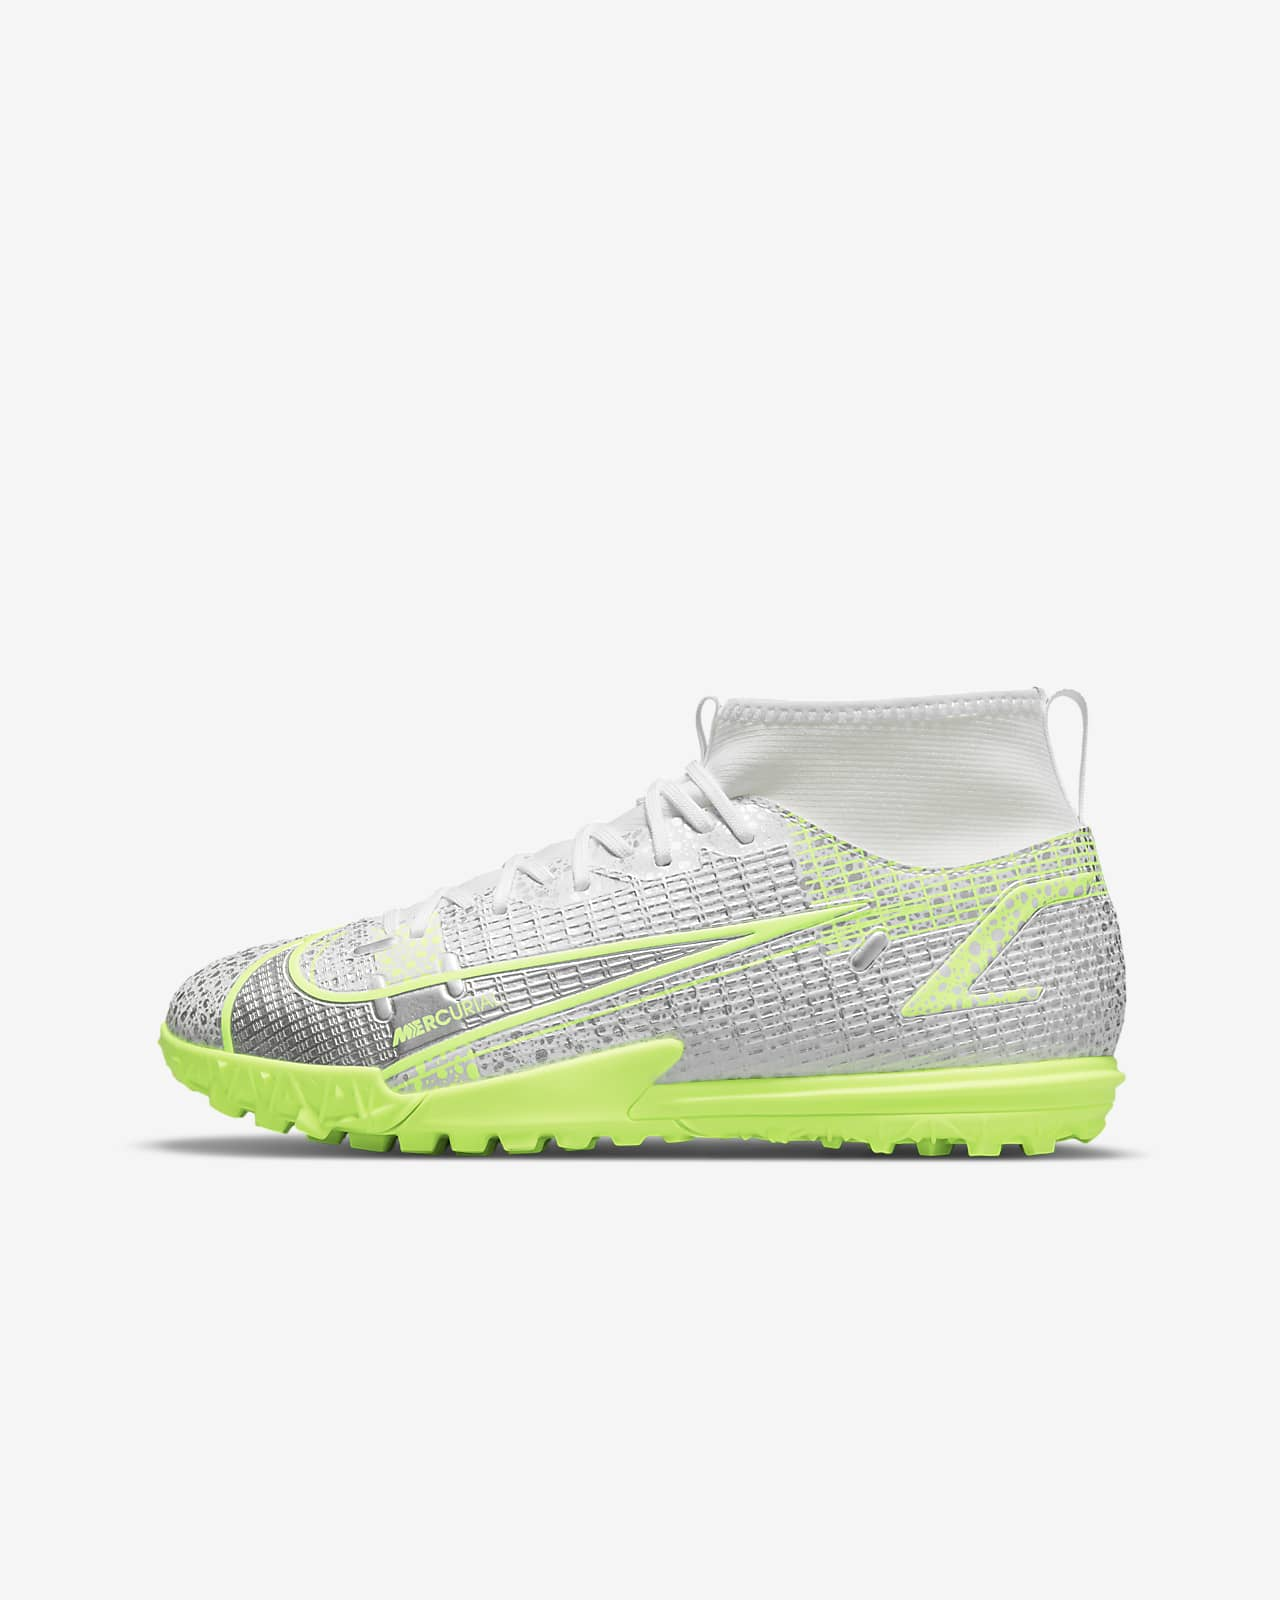 Nike Jr. Mercurial Superfly 8 Academy TF Little/Big Kids' Artificial-Turf Soccer Shoe